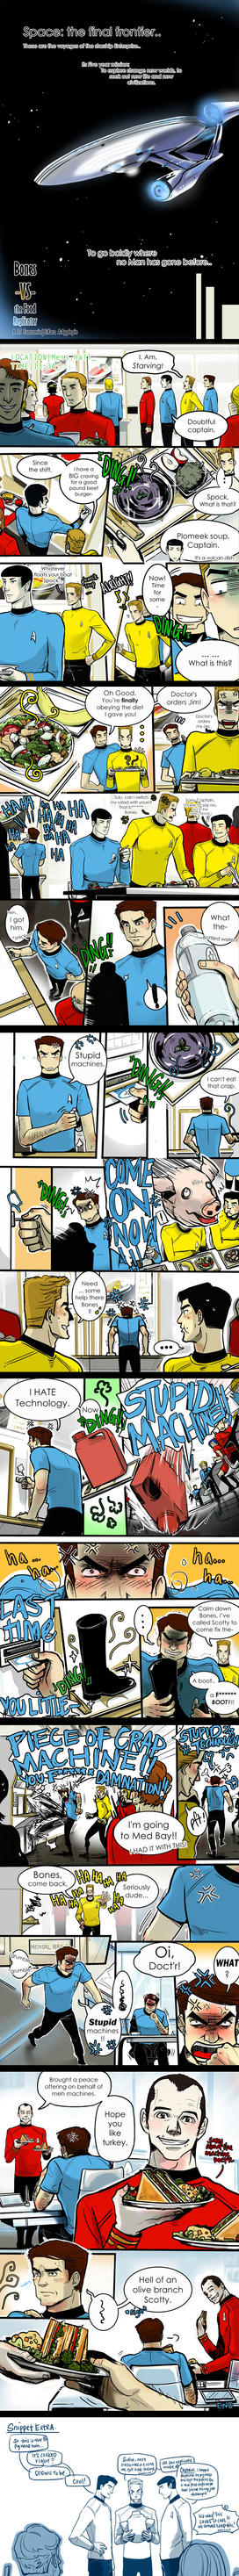 ST_comic: Bones vs the Food Replicator by applepie1989